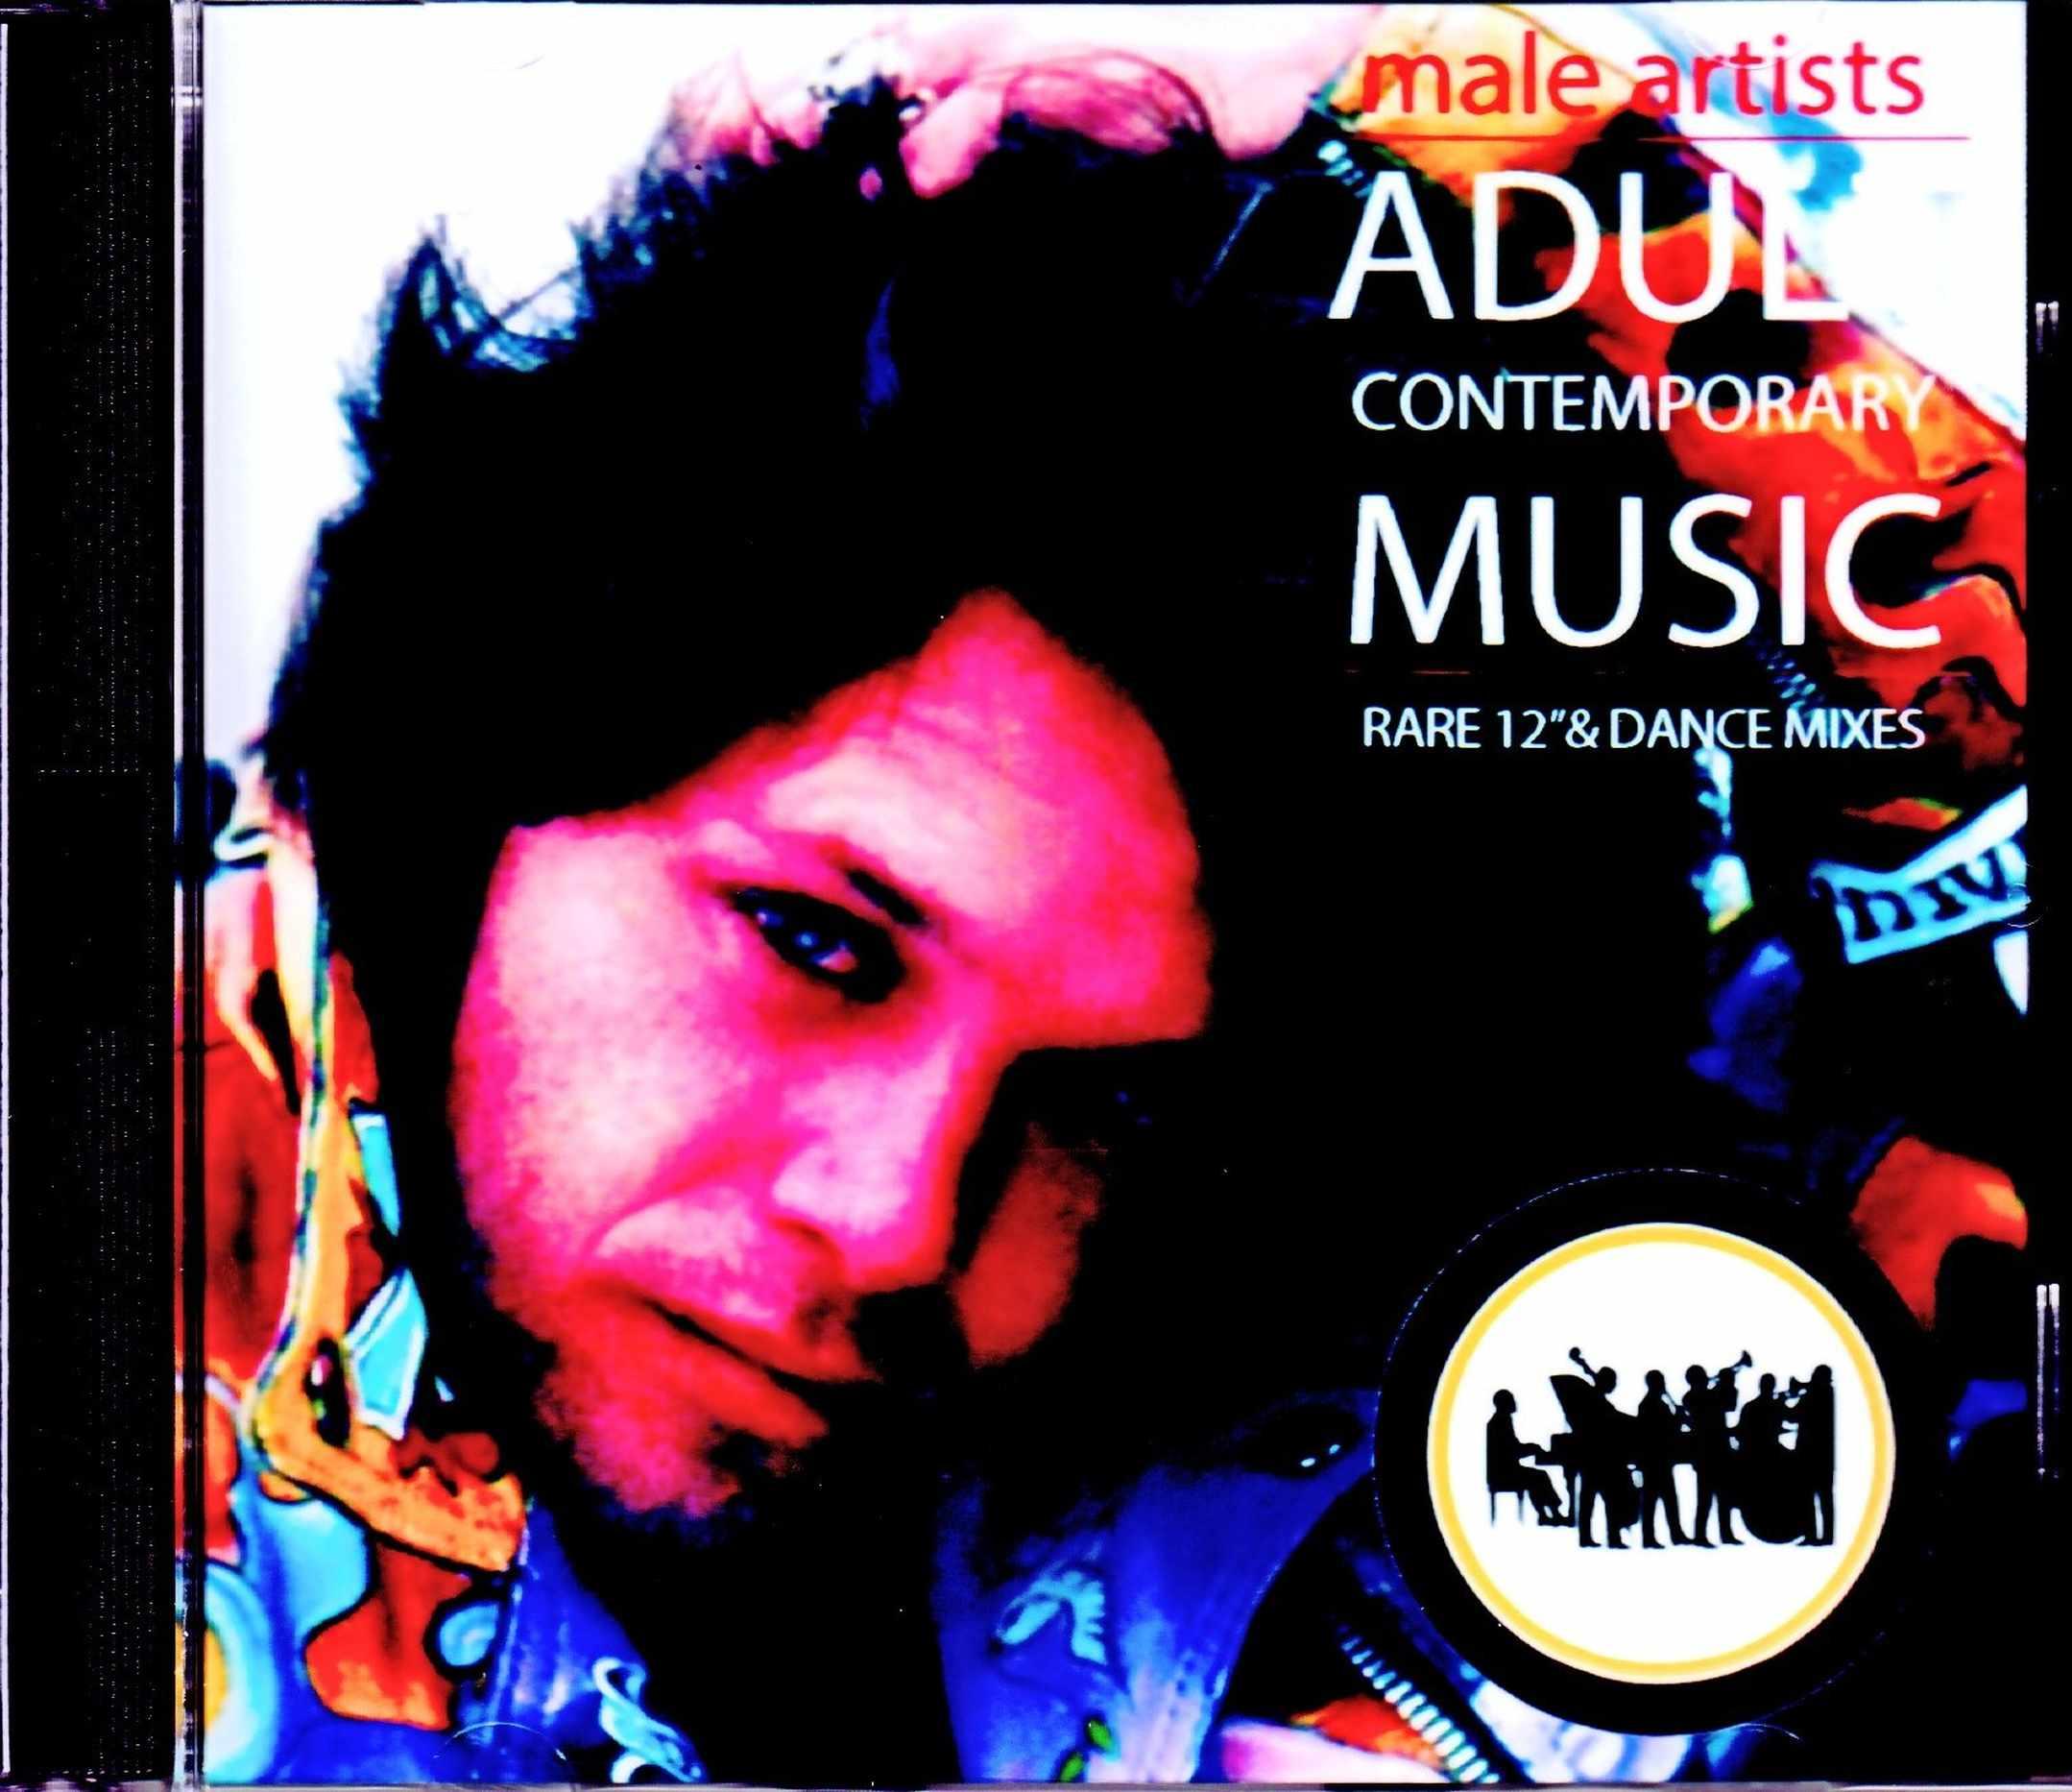 "Various Artists John Cougar,Dire Straits,Men at Work,ZZ top,Billy Idol/Male Artists Rare 12"" & Dance Mixes Vol.15"